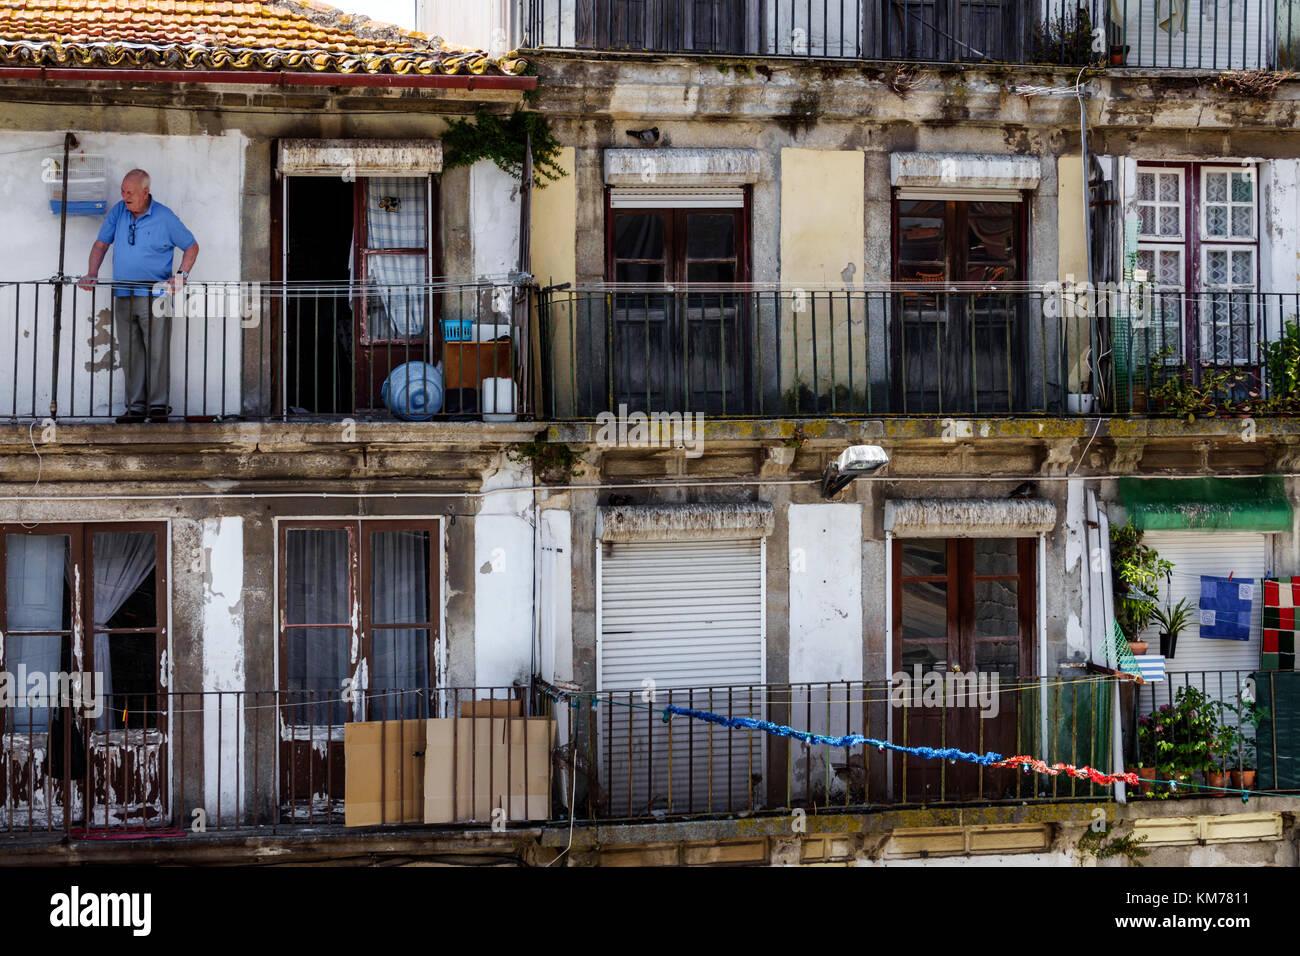 Porto Portugal historic center Ribeira neighborhood residential apartment building flats balcony man senior dilapidated - Stock Image